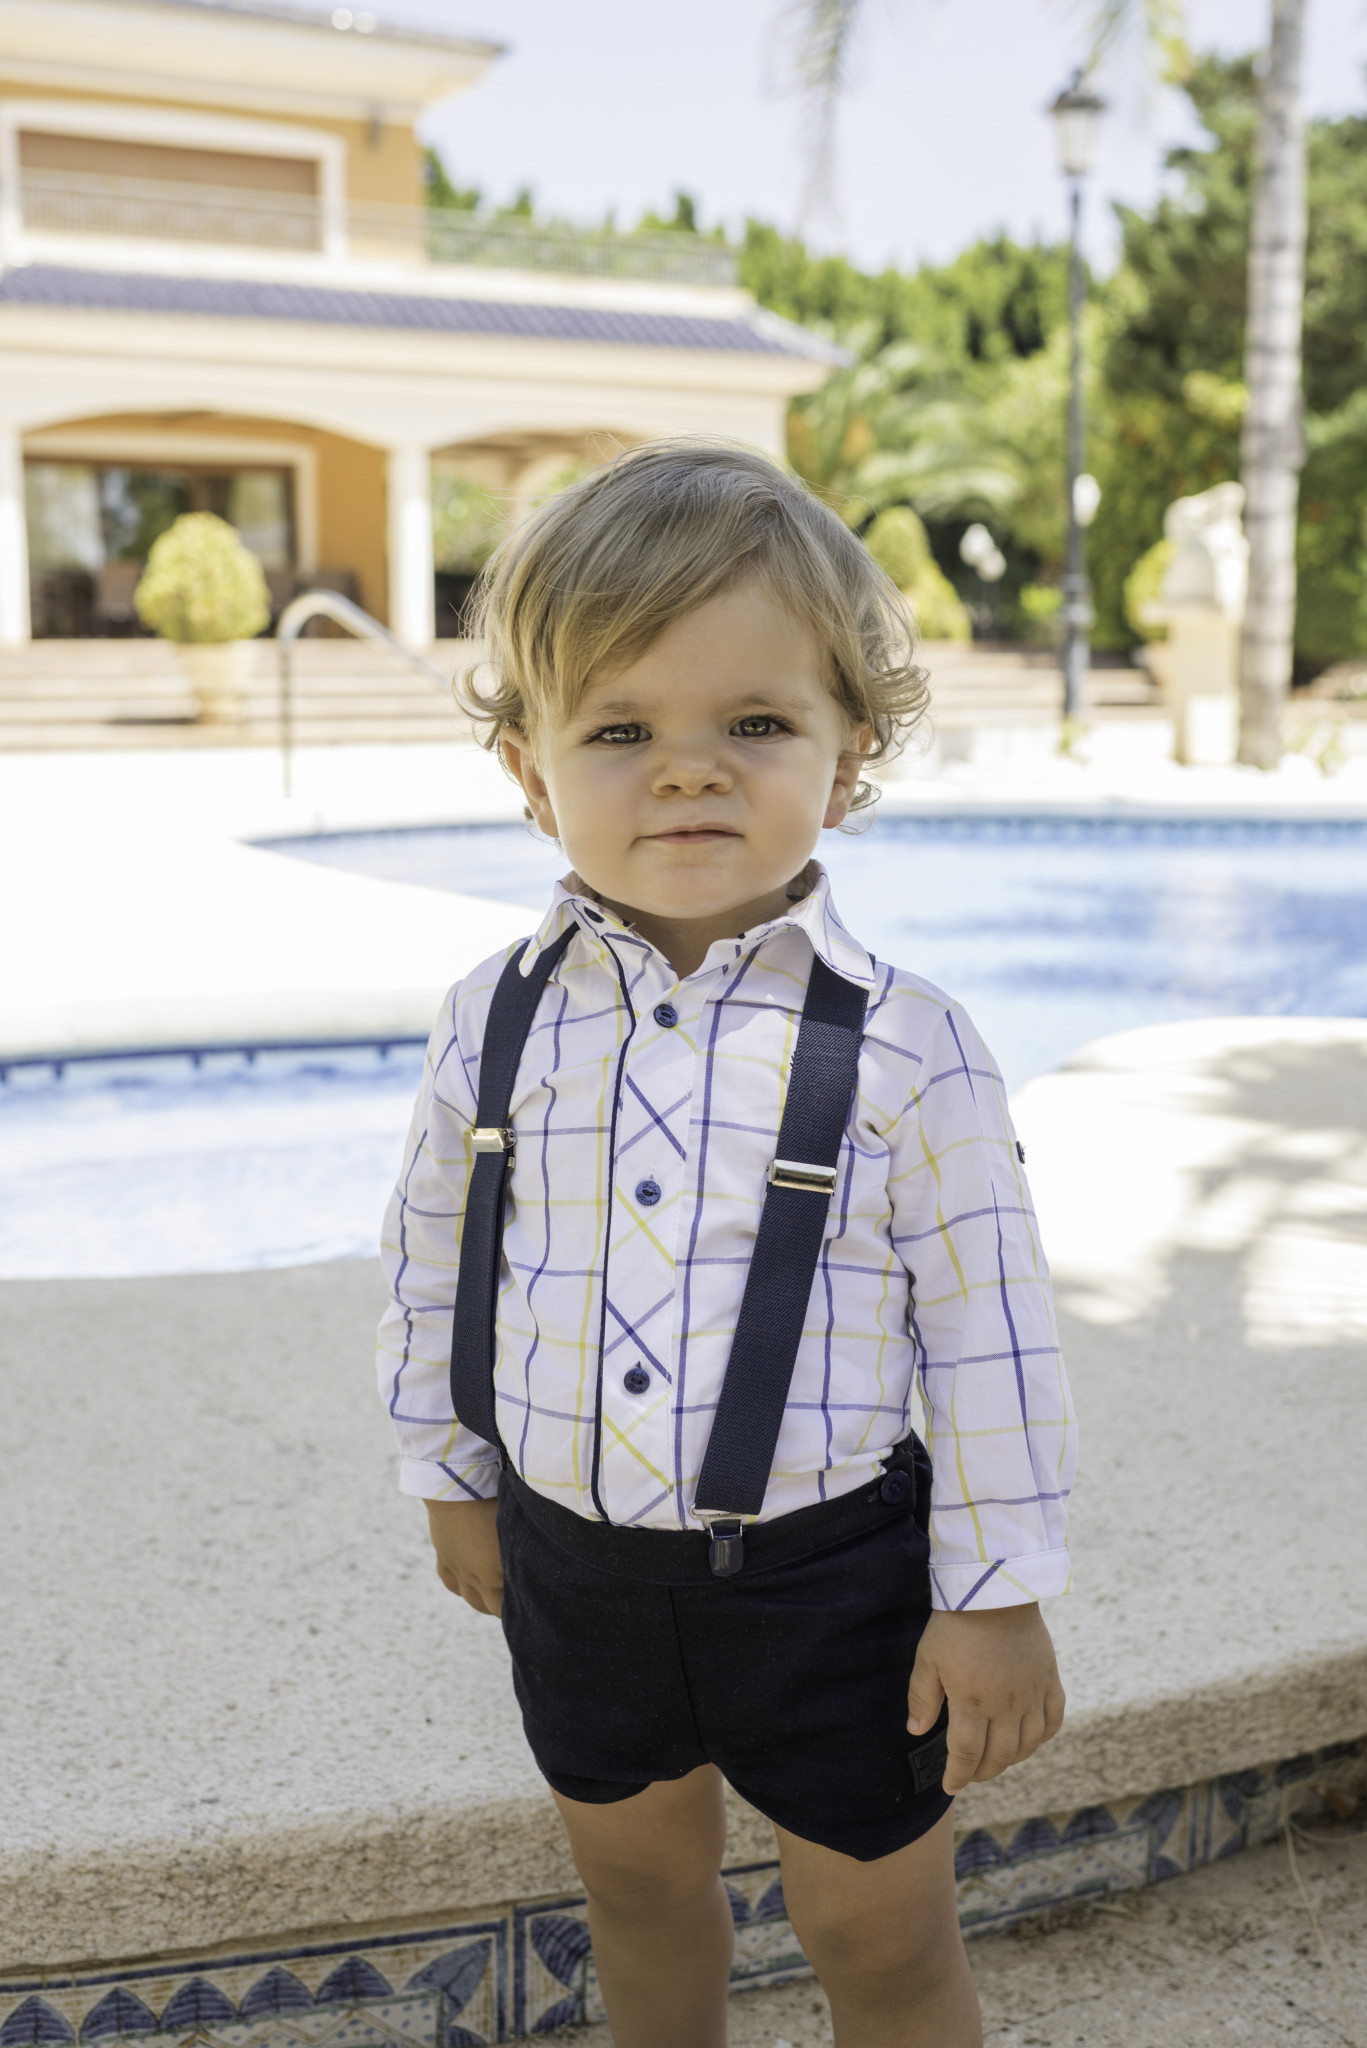 Dolce Petit Dolce Petit Boys Short Sleeve Shirt set with braces 2122/23C